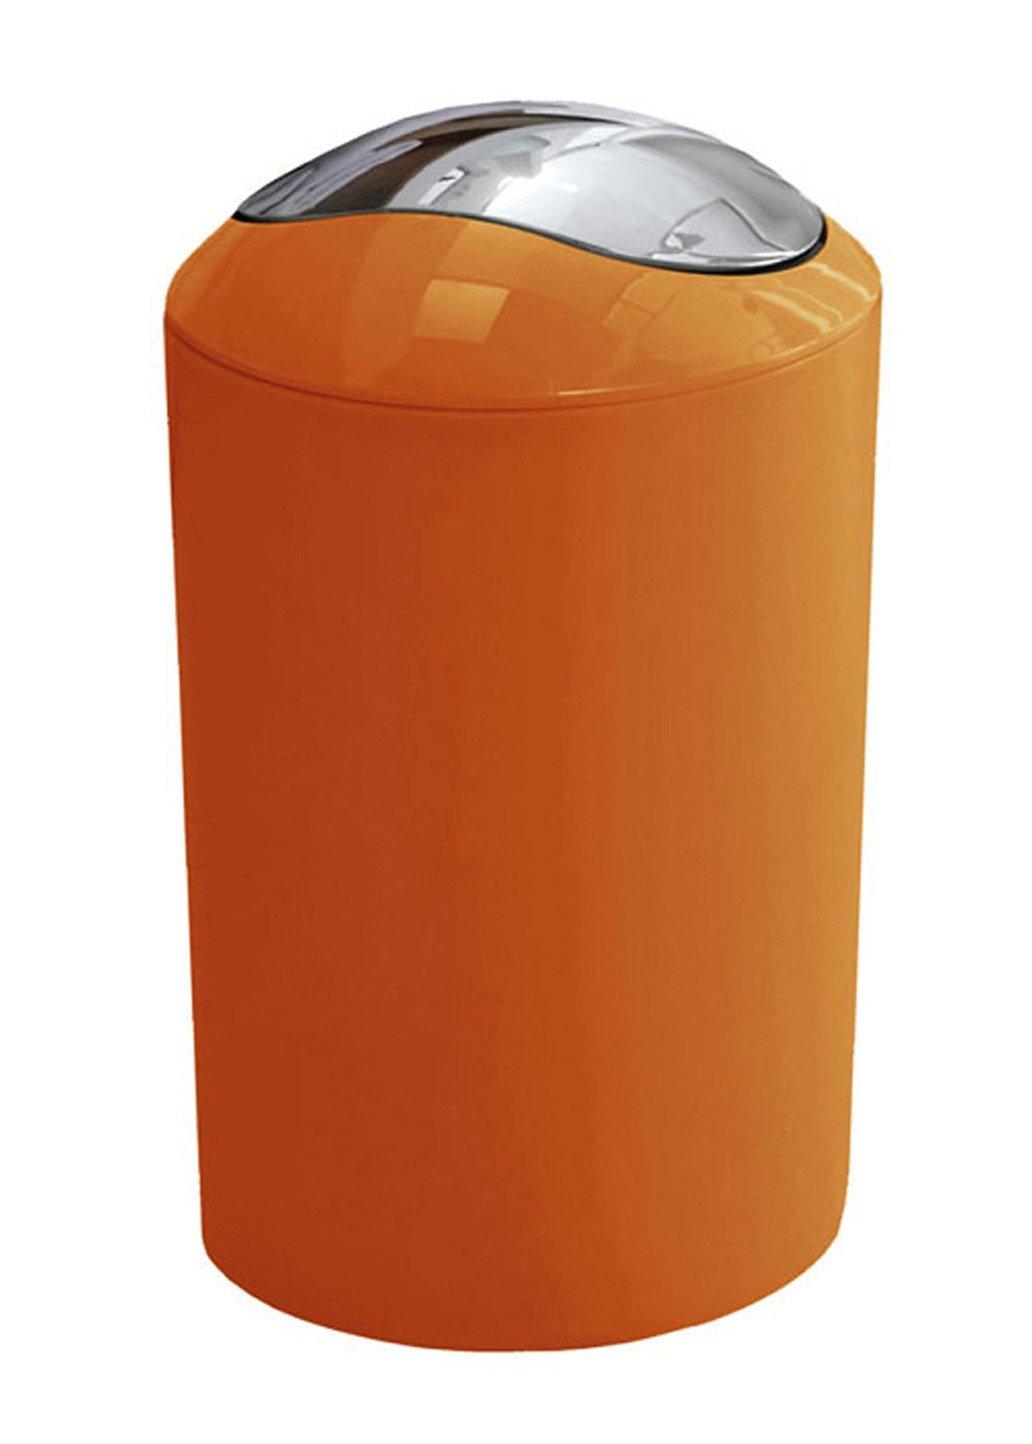 Kosmetikeimer Glossy Orange B:20cm